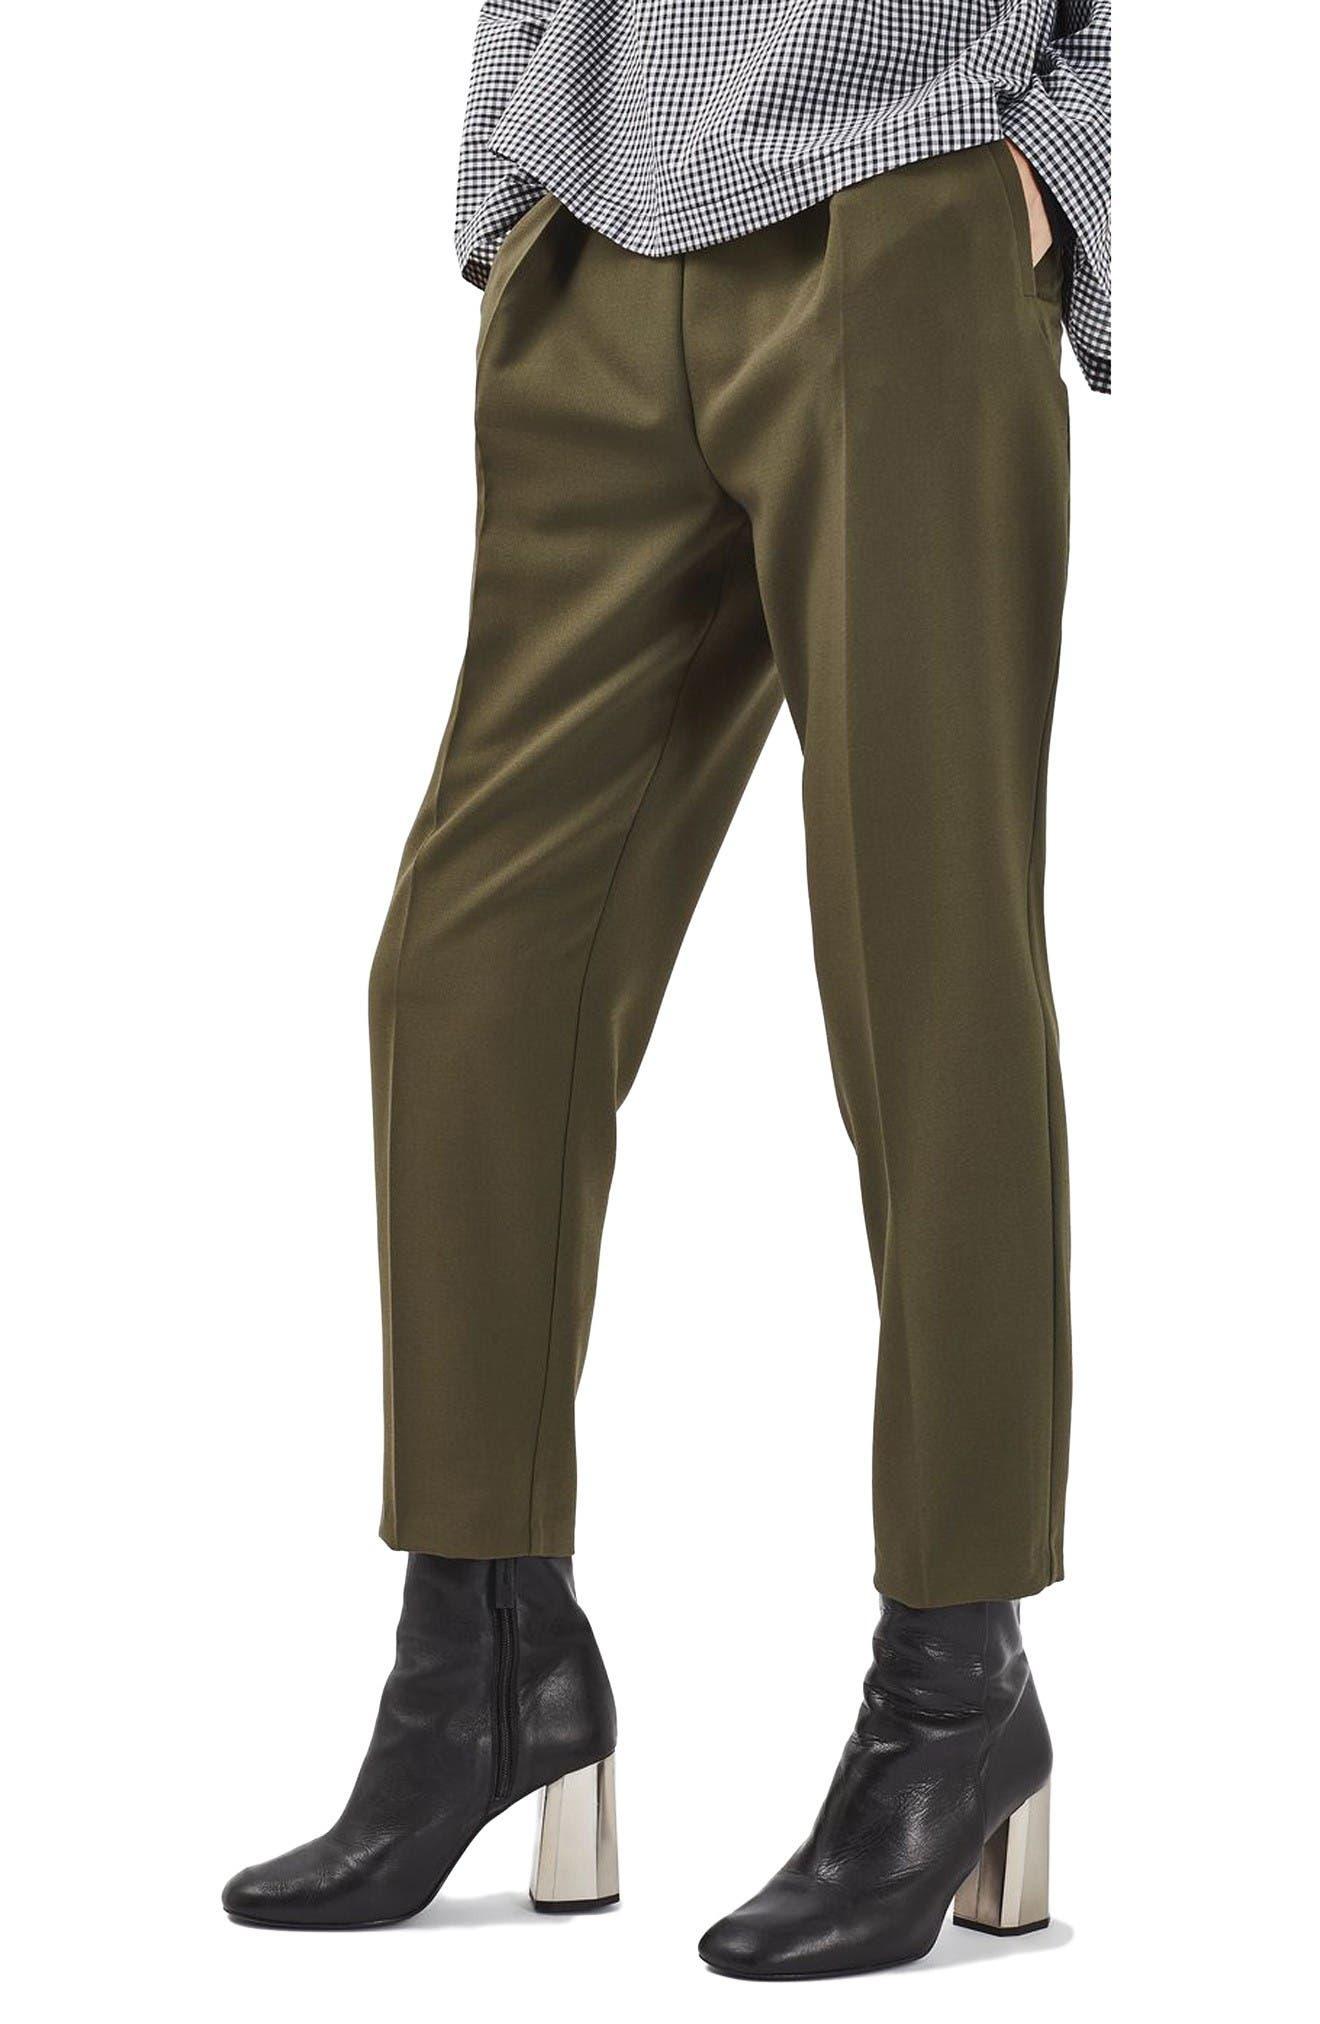 Alternate Image 1 Selected - Topshop Grommet Detail Peg Trousers